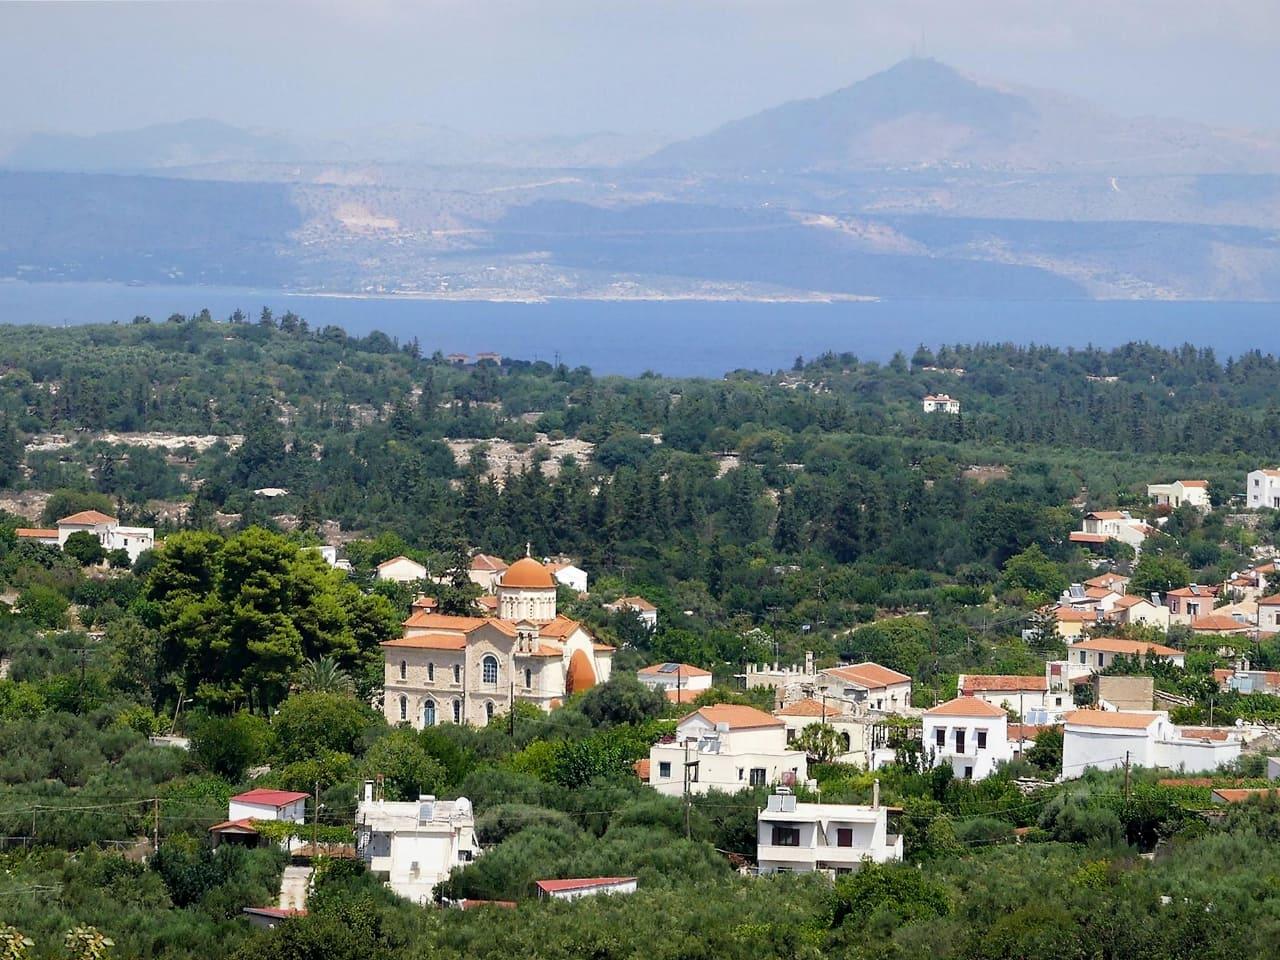 gavalochori village apokoronas region chania, historical village chania